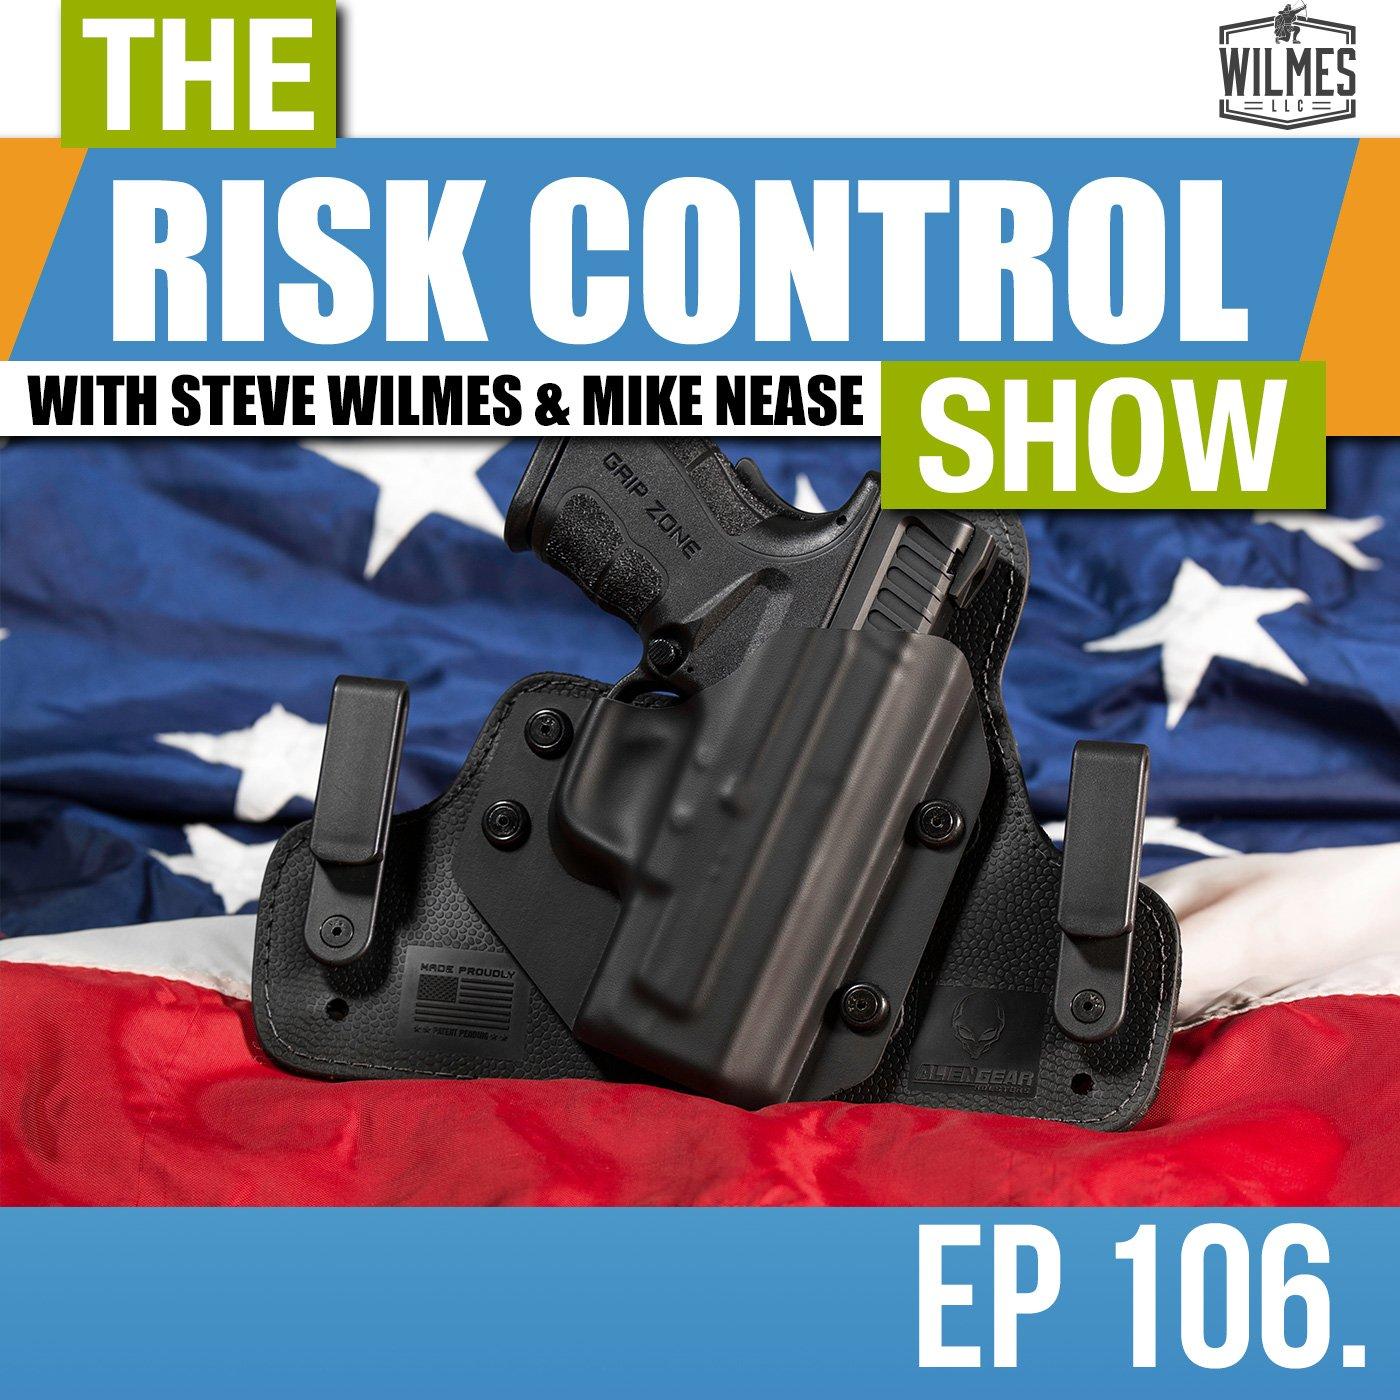 The Risk Control Show Ep 107. Should Teachers Have Guns?